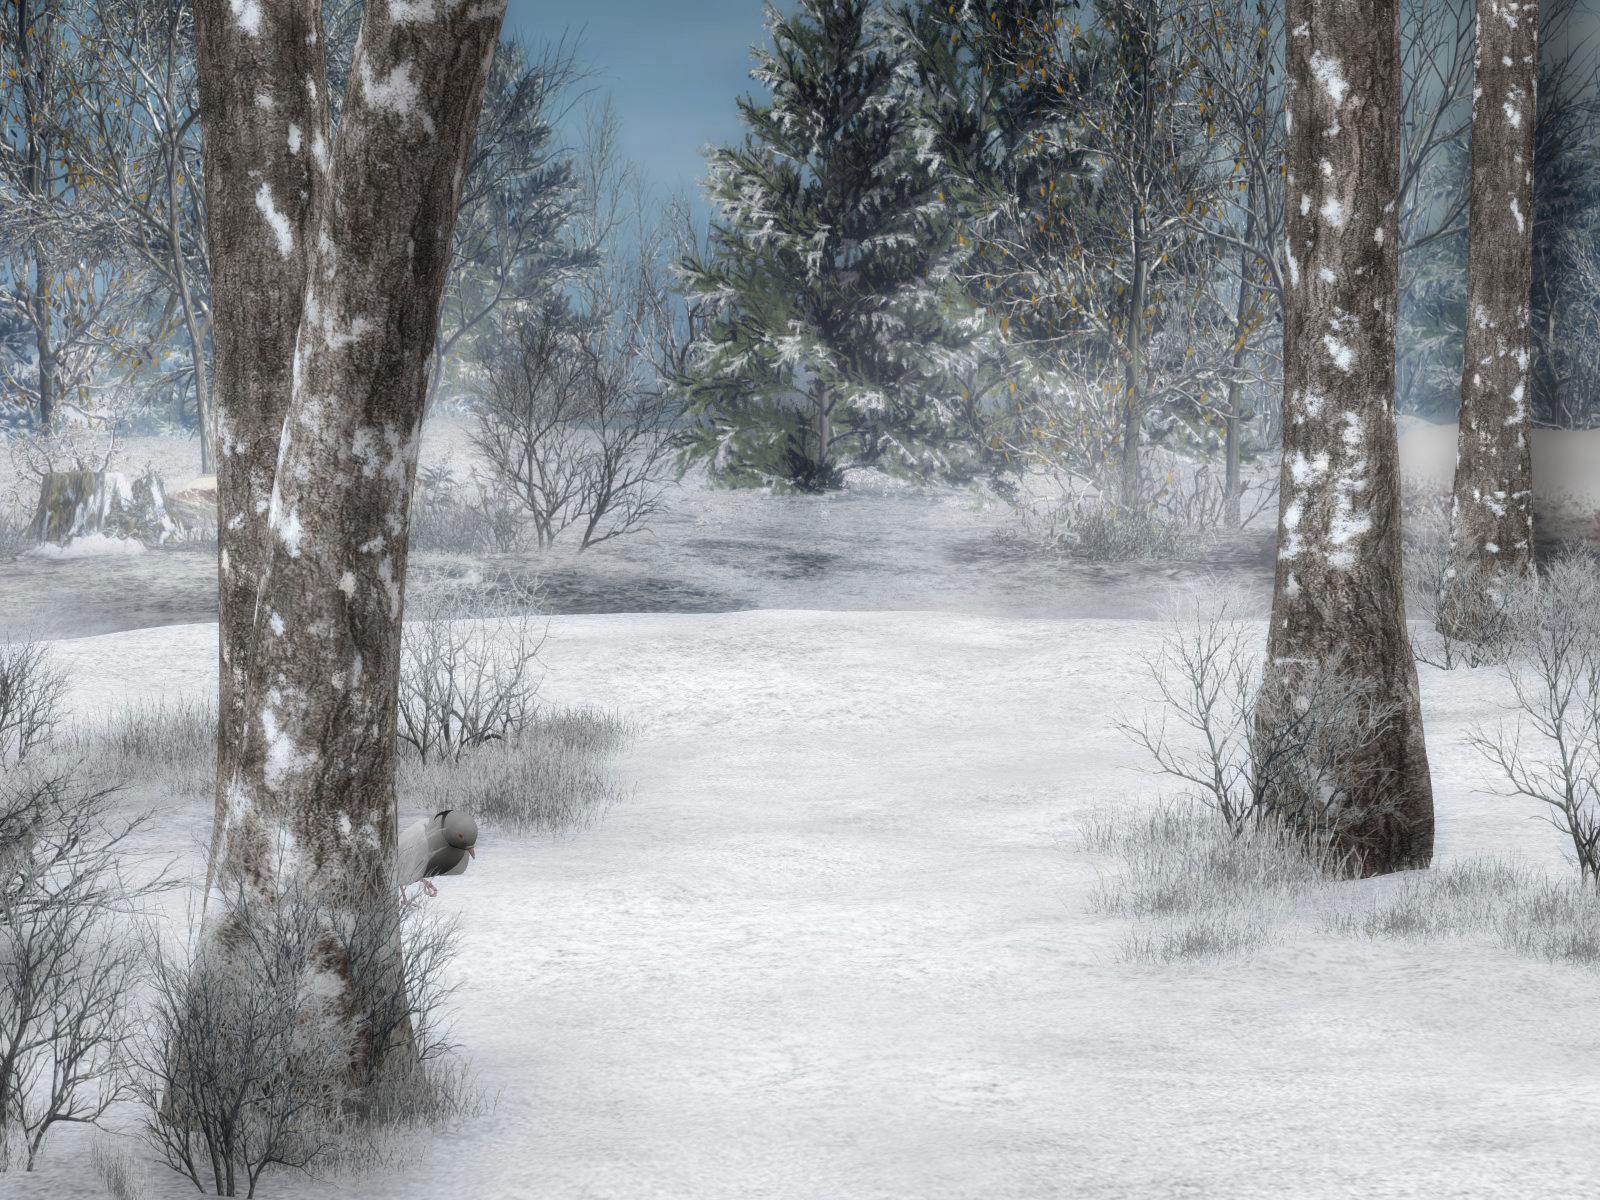 http://fc08.deviantart.net/fs7/f/2006/346/d/4/Winter_Background_4_by_BlackStock.jpg